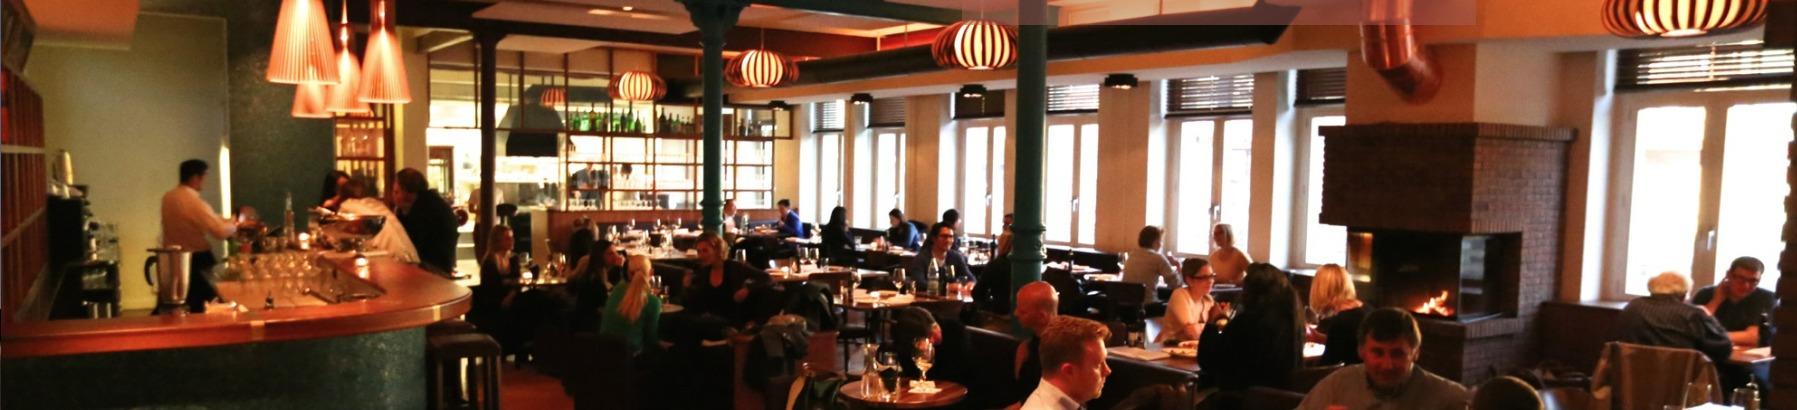 Bistro Gleis 9 / Restaurant Perron 9